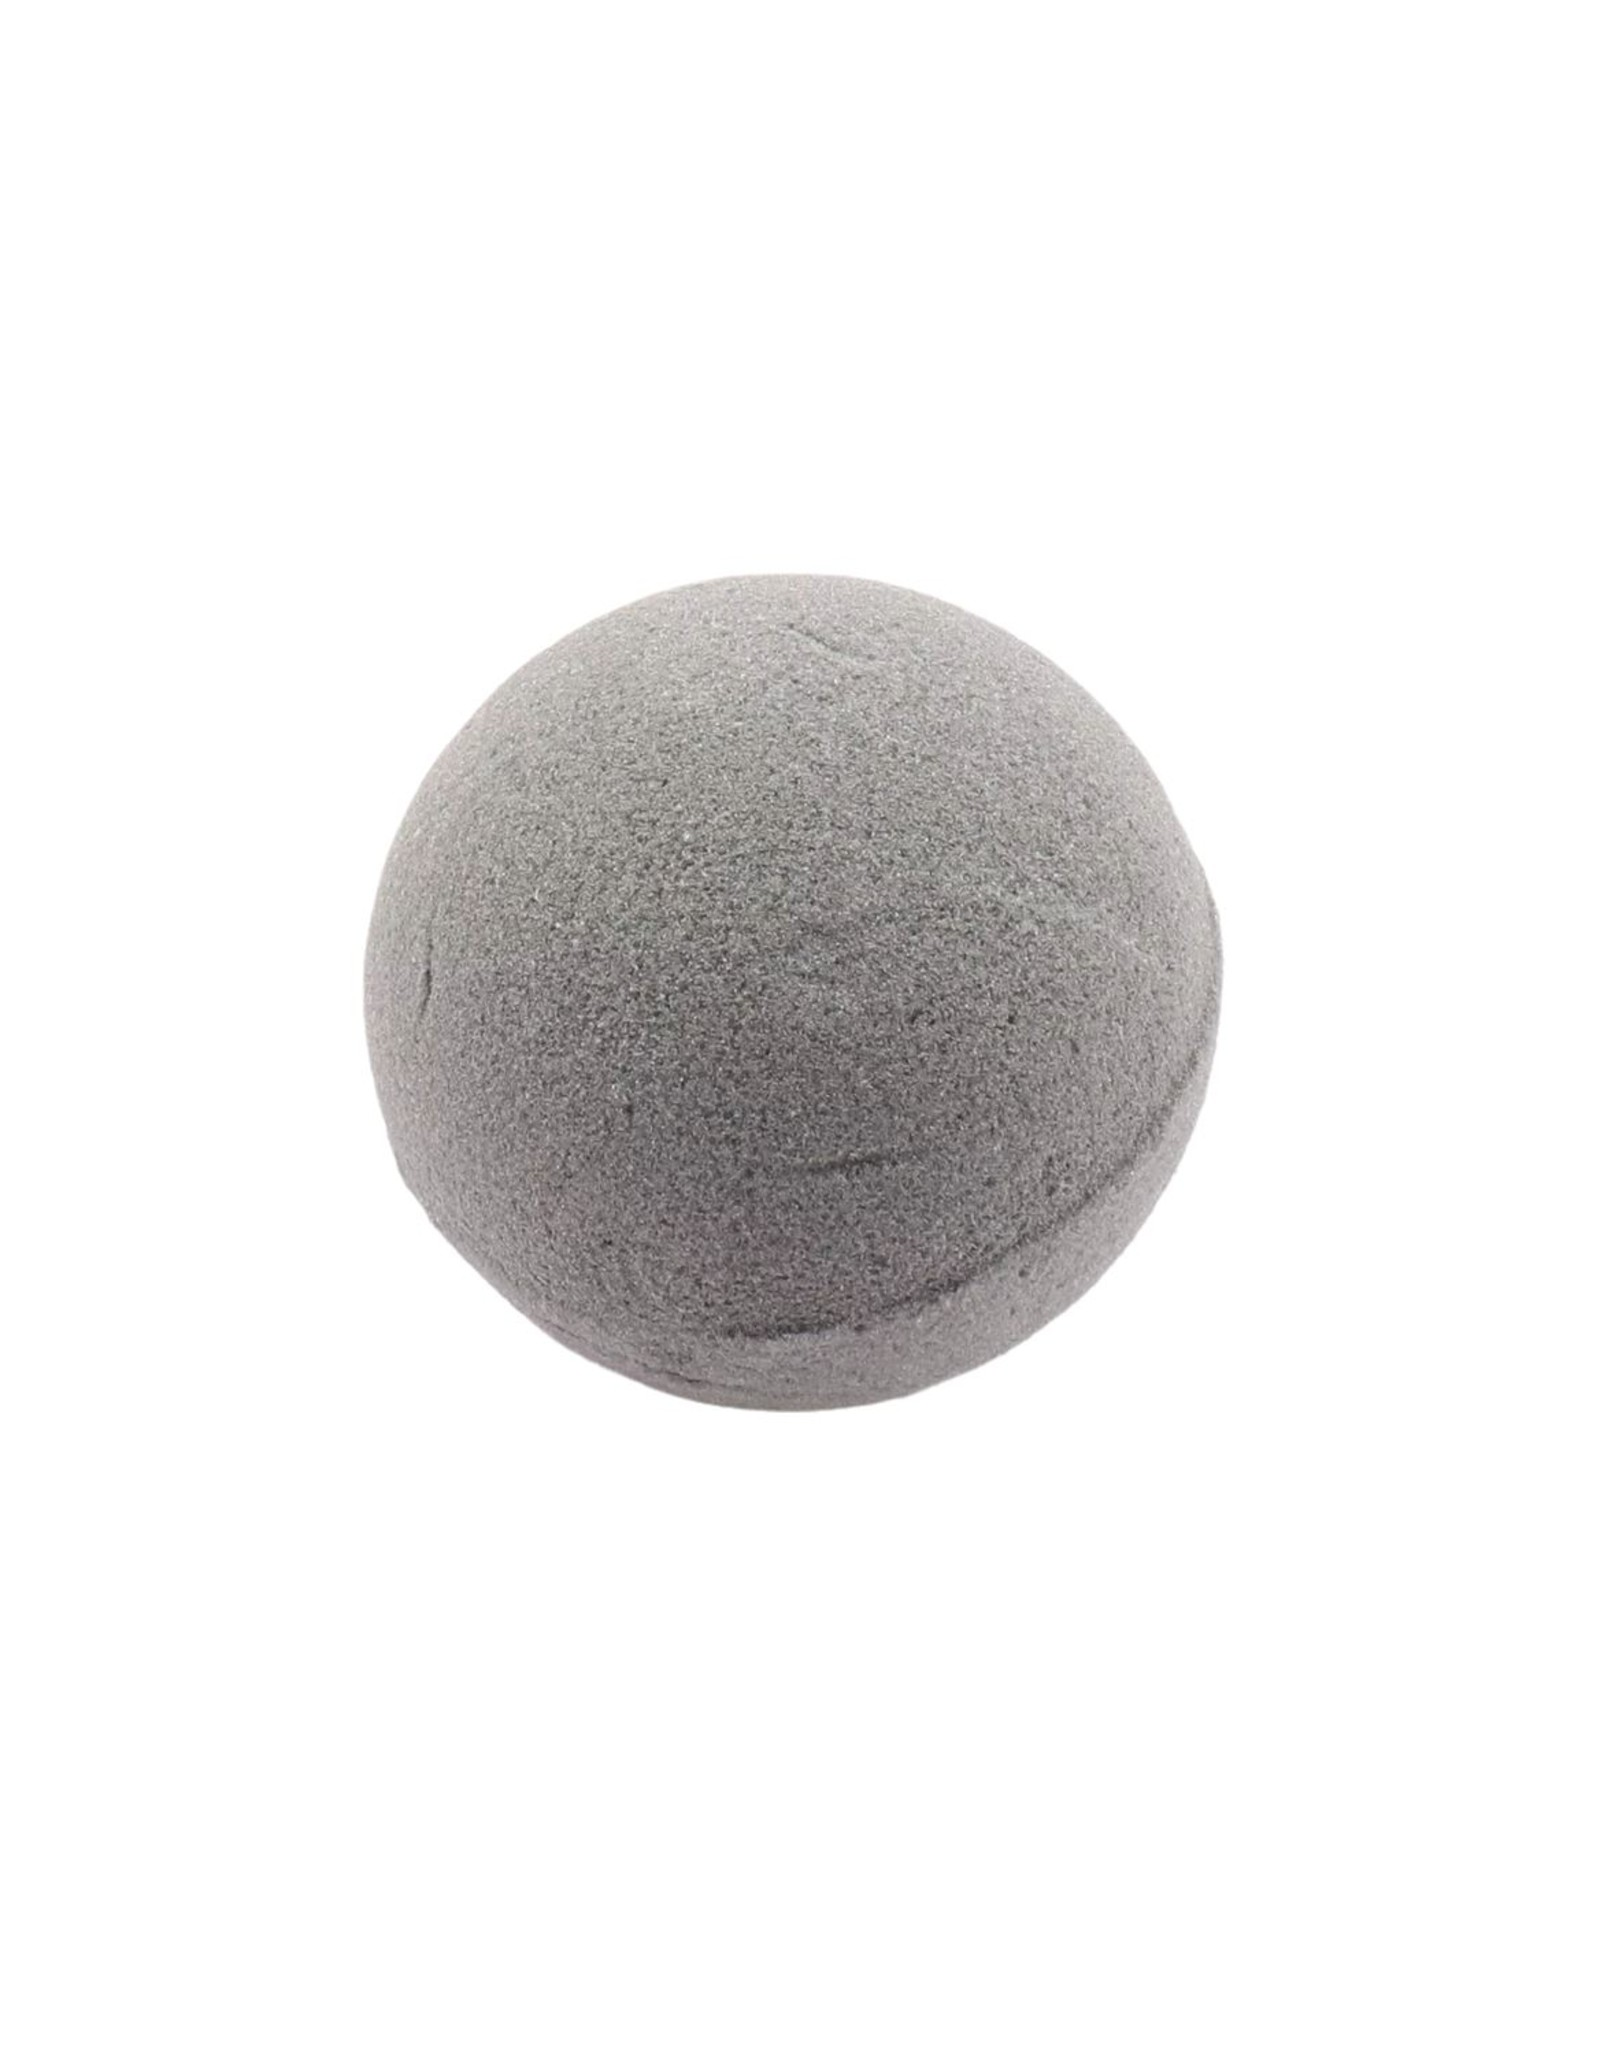 HD Basic Ball Sld Dry Foam D10.0 x 18